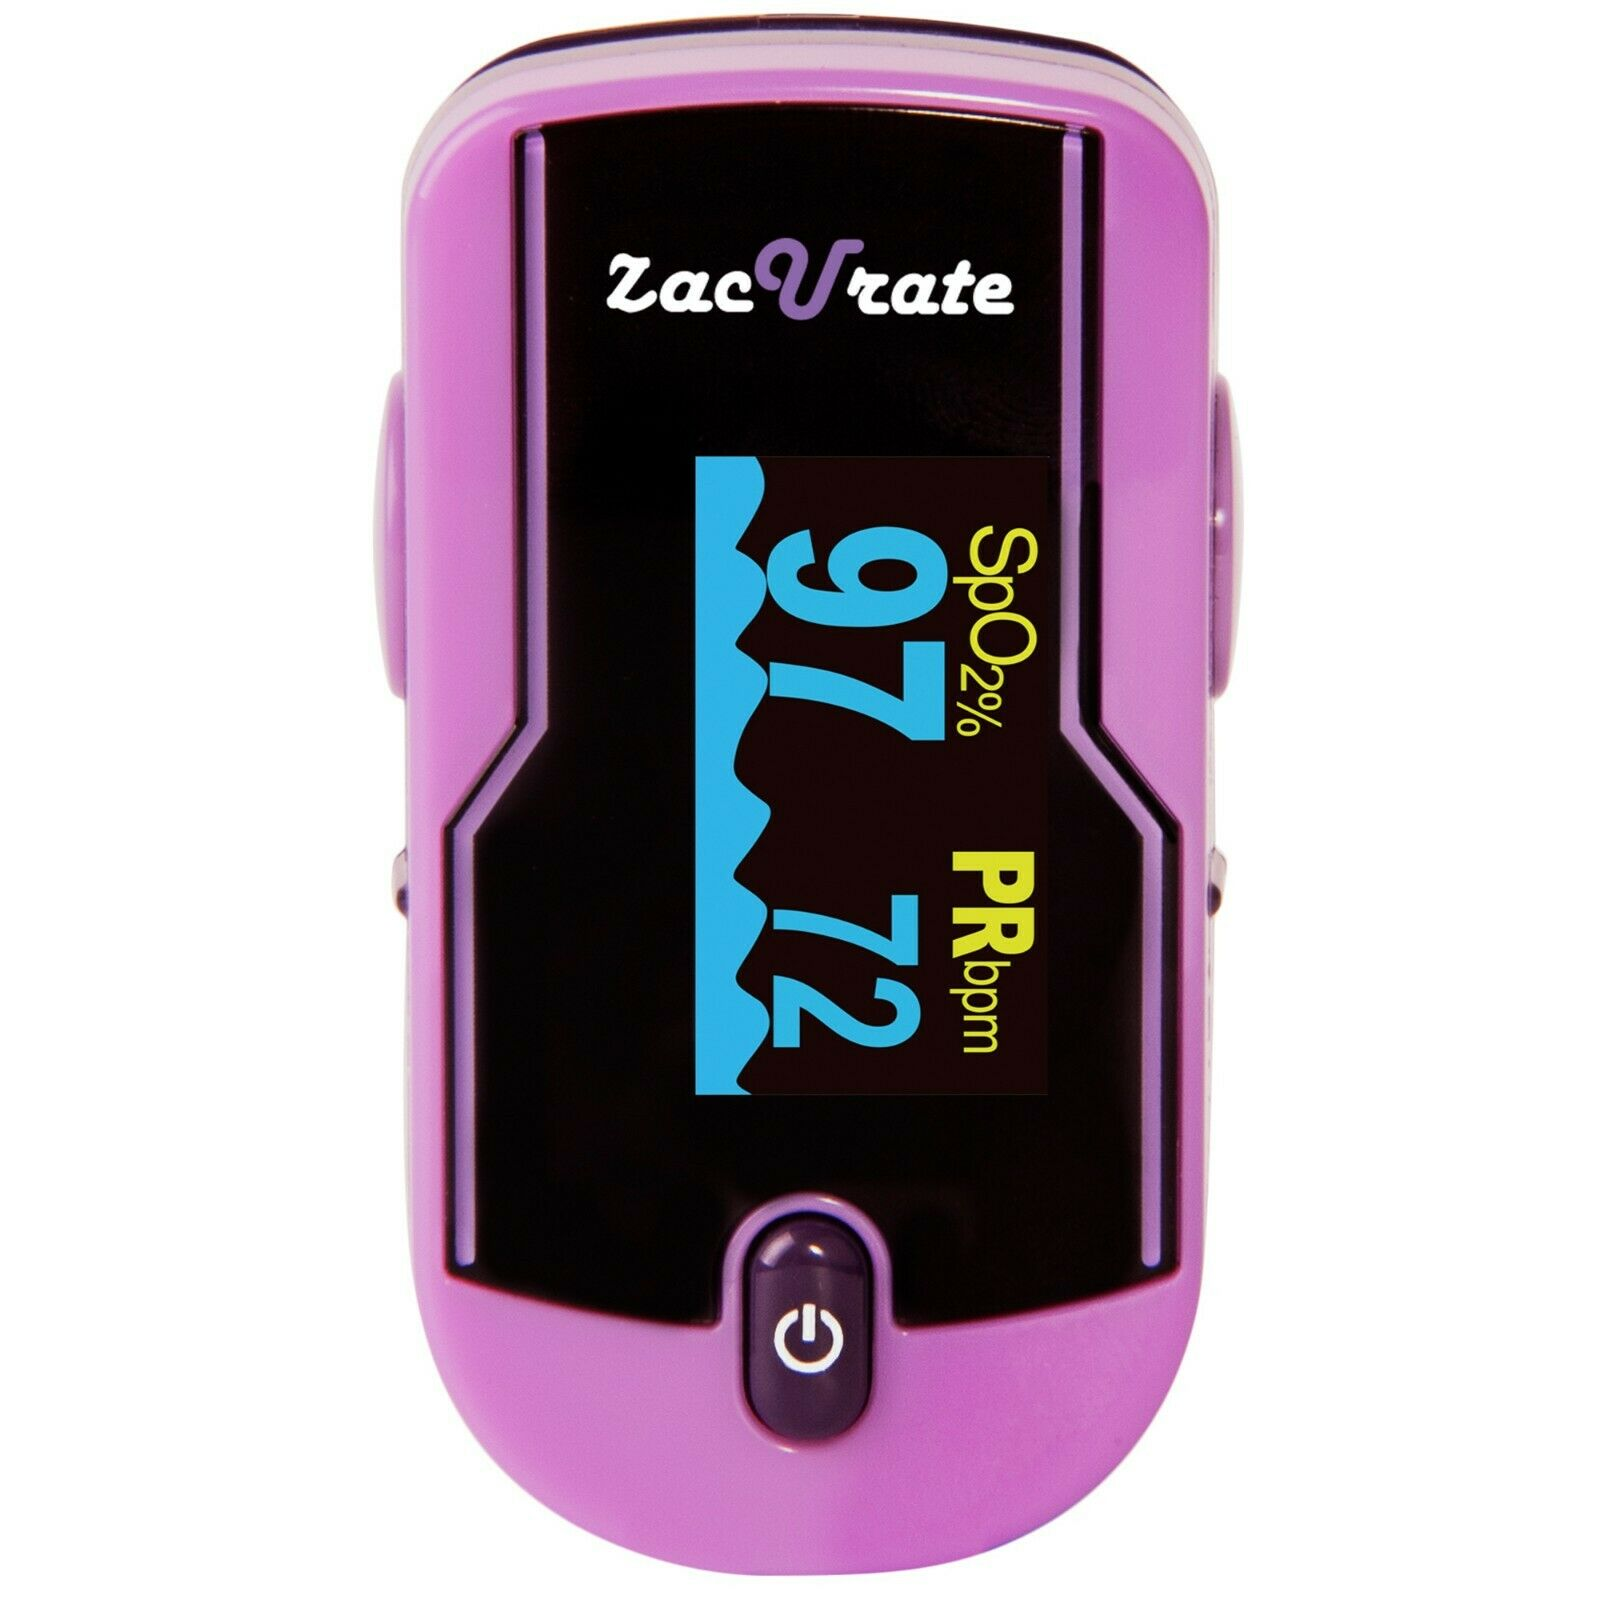 Zacurate 500E Purple Fingertip Pulse Oximeter Heart Rate